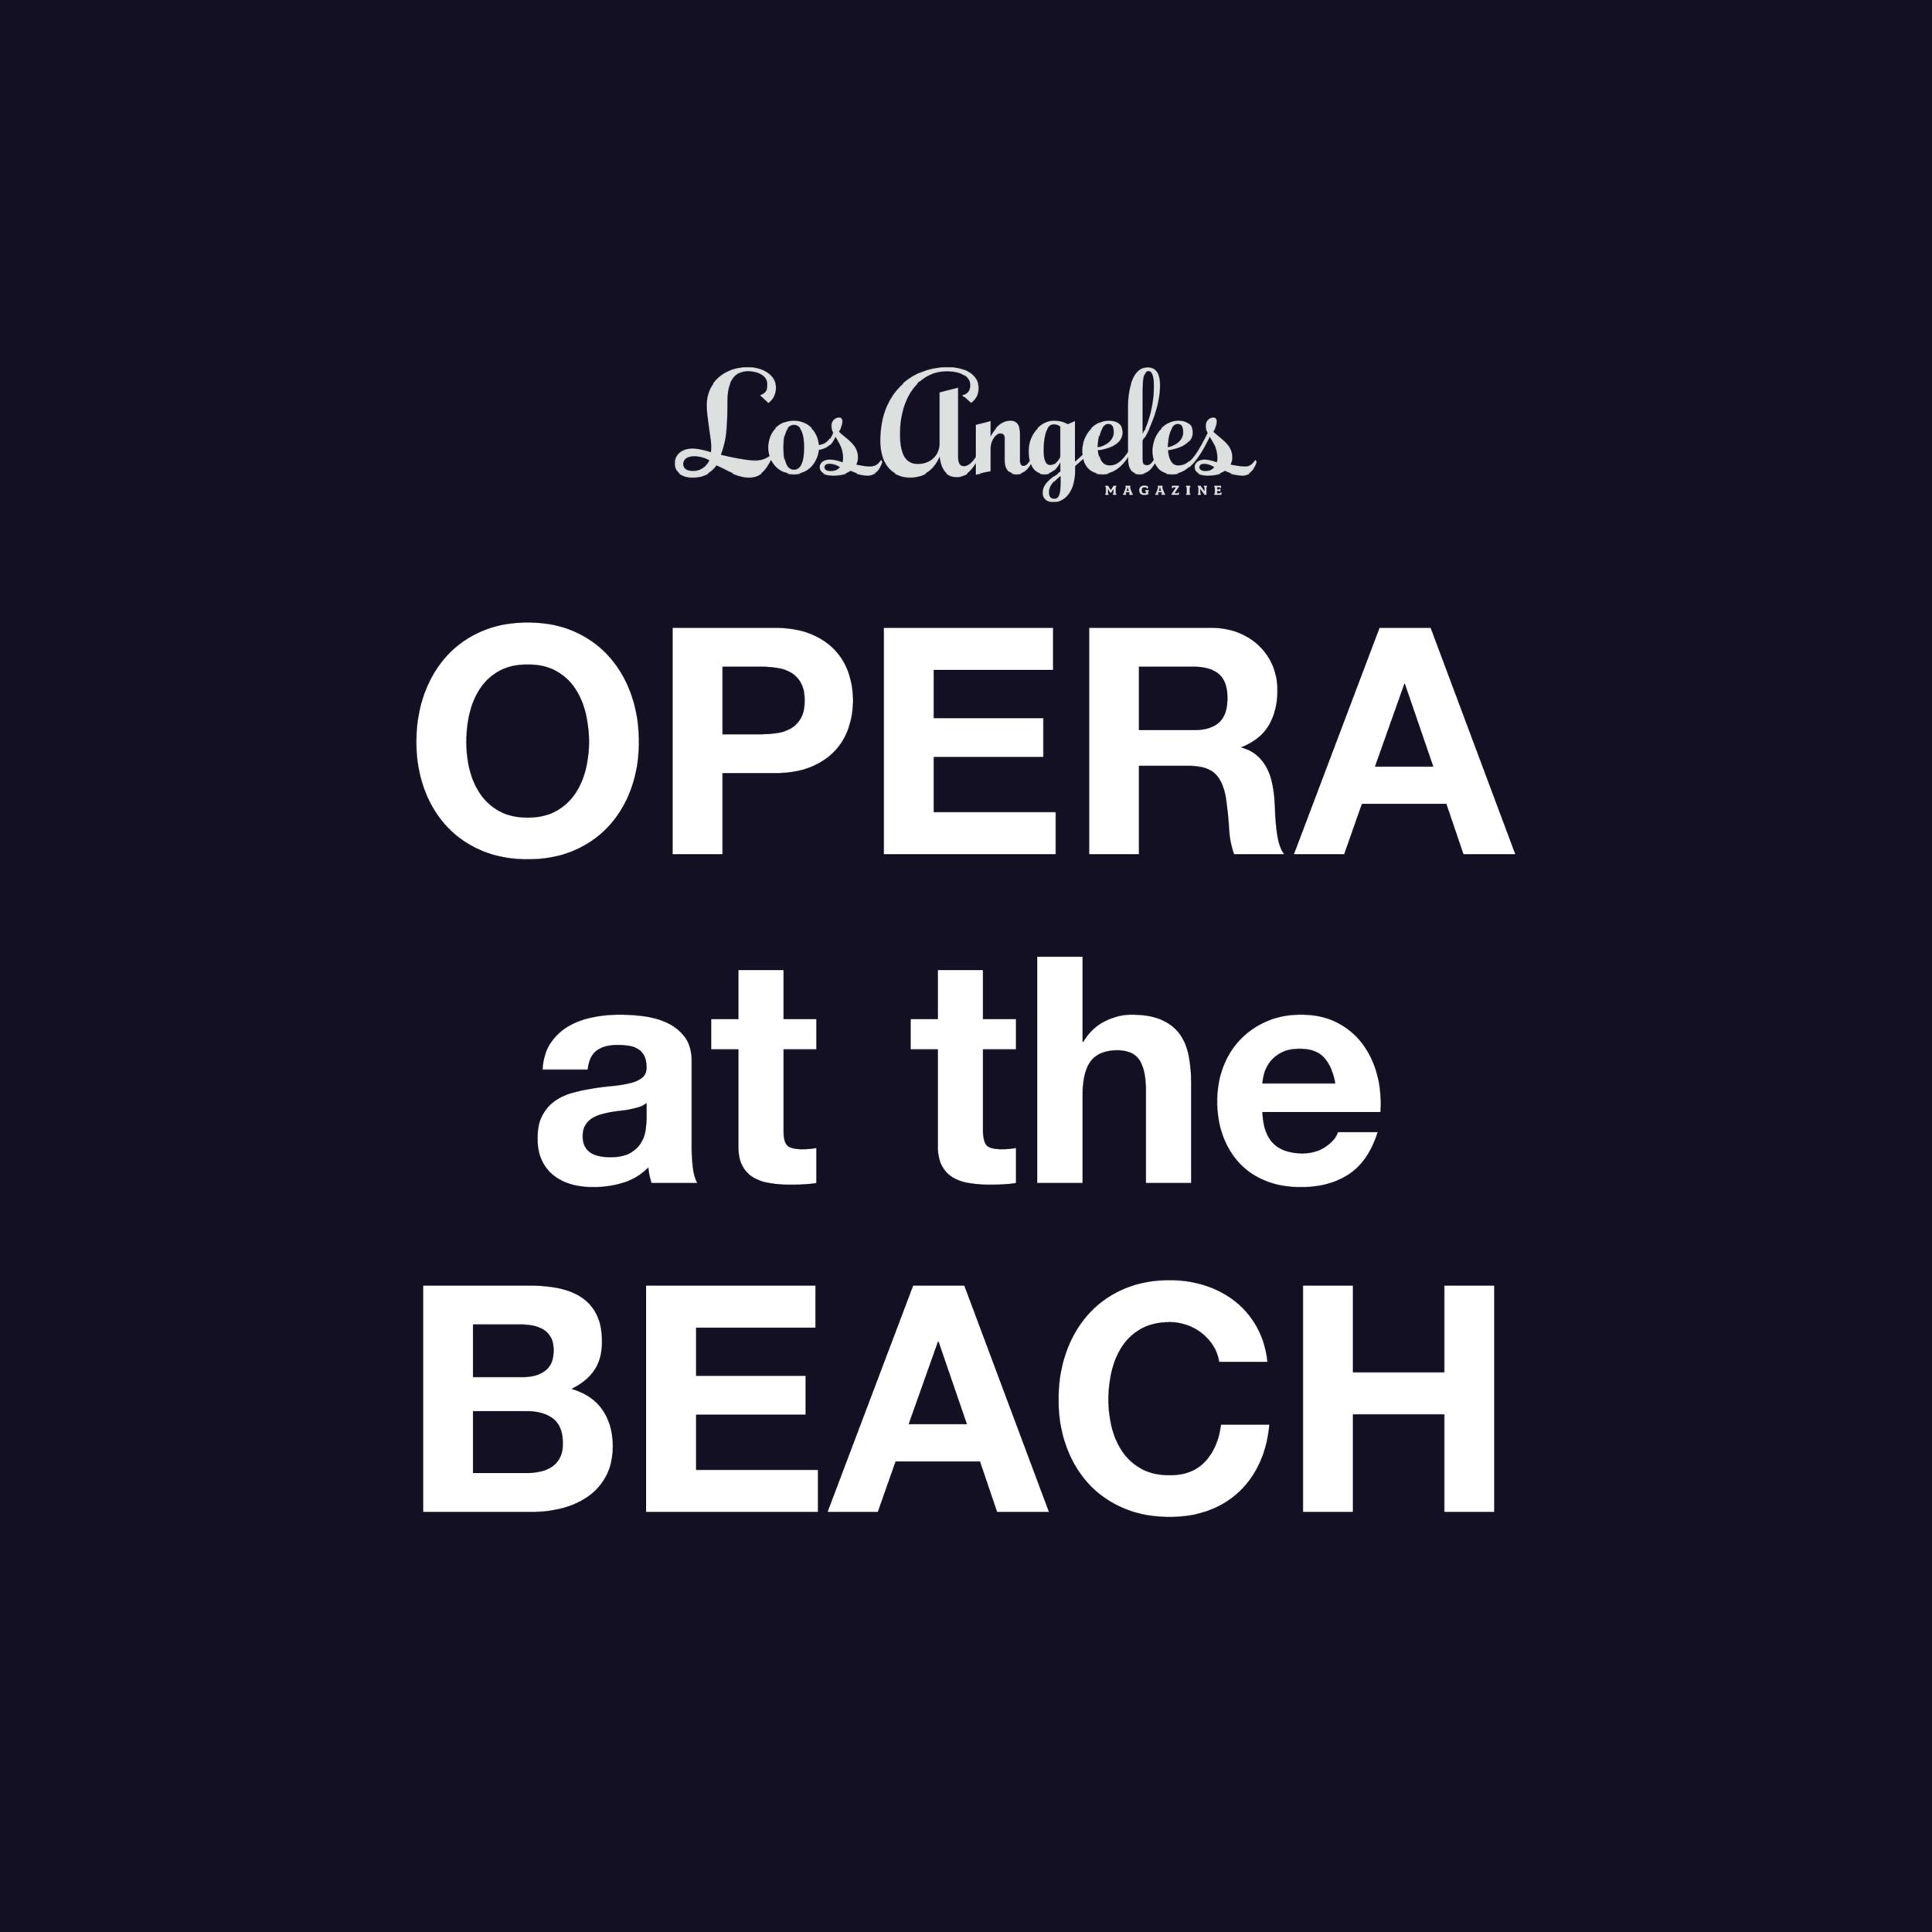 Opera at the Beach Santa Monica September 28, 2019  6:00 PM - 9:30 PM